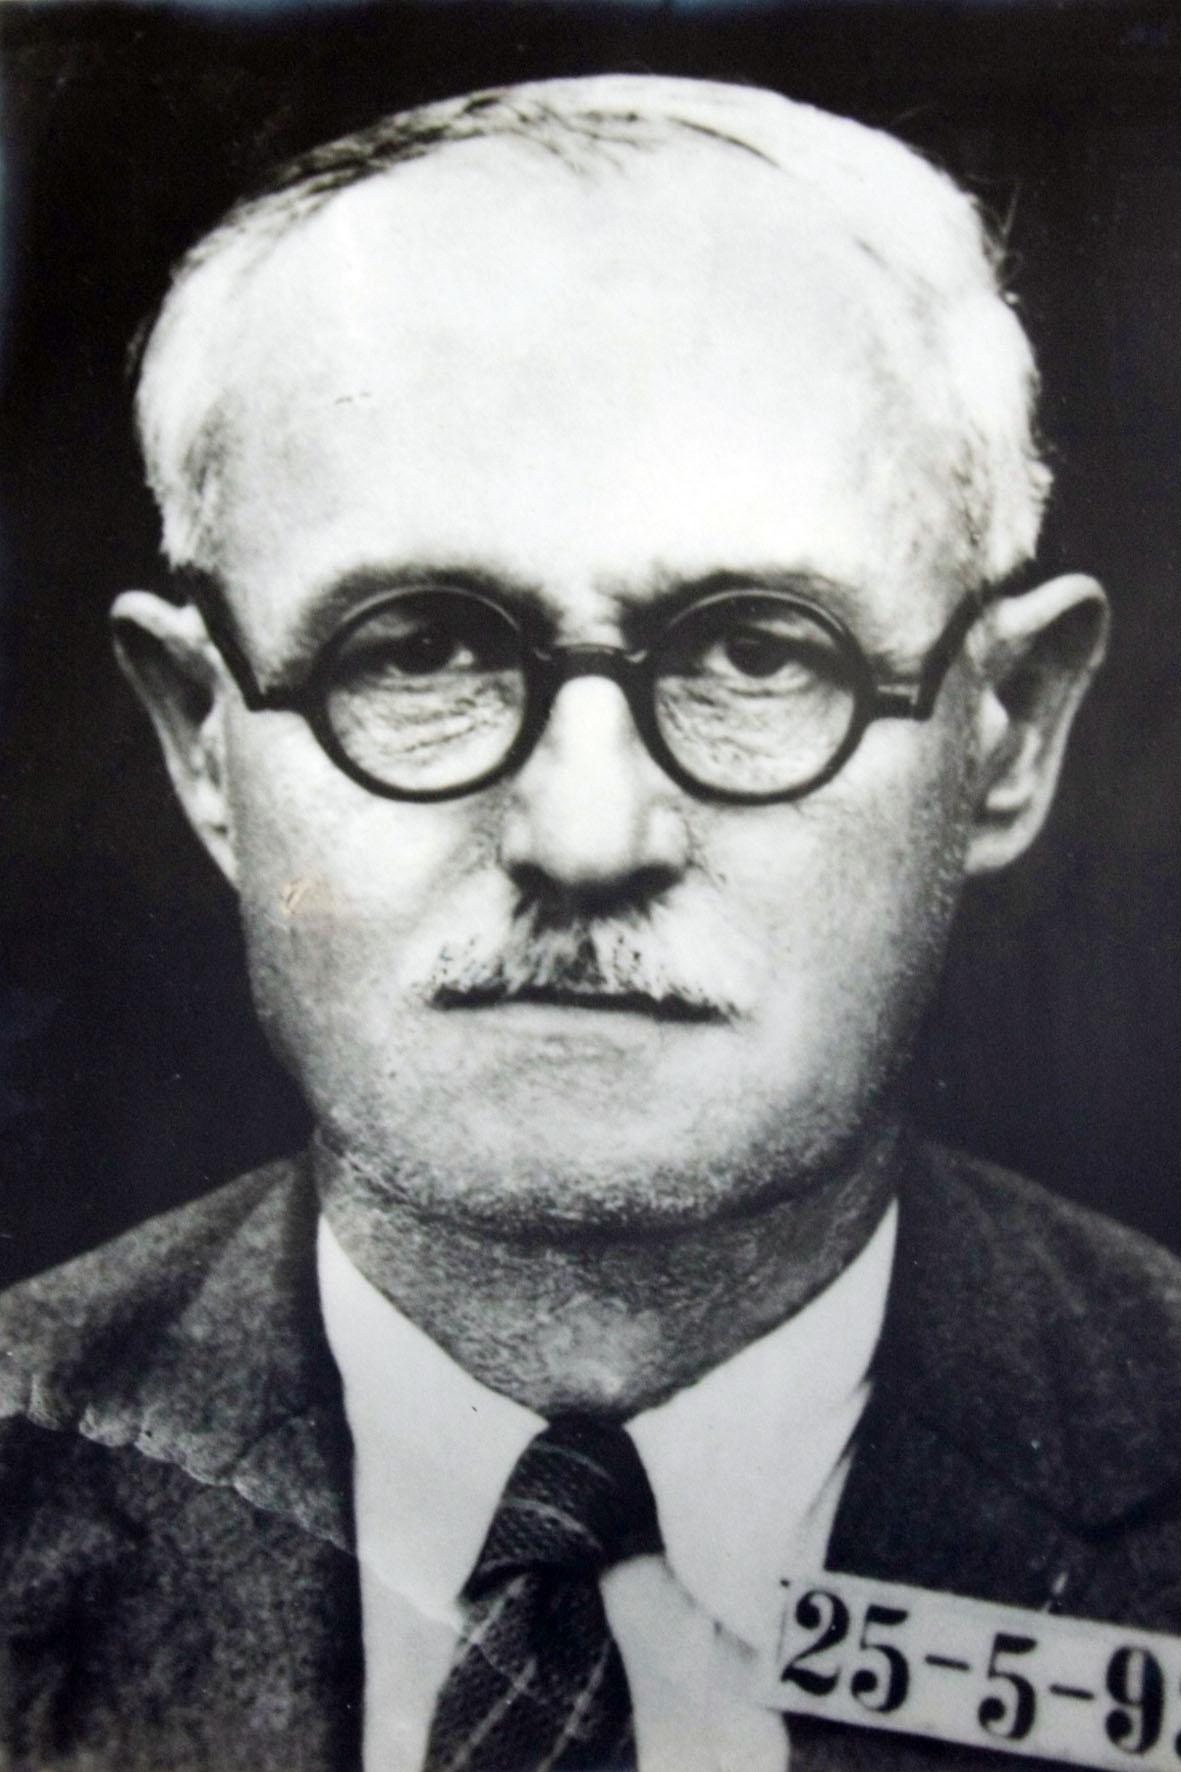 Conselheiro Alberto Steigleder